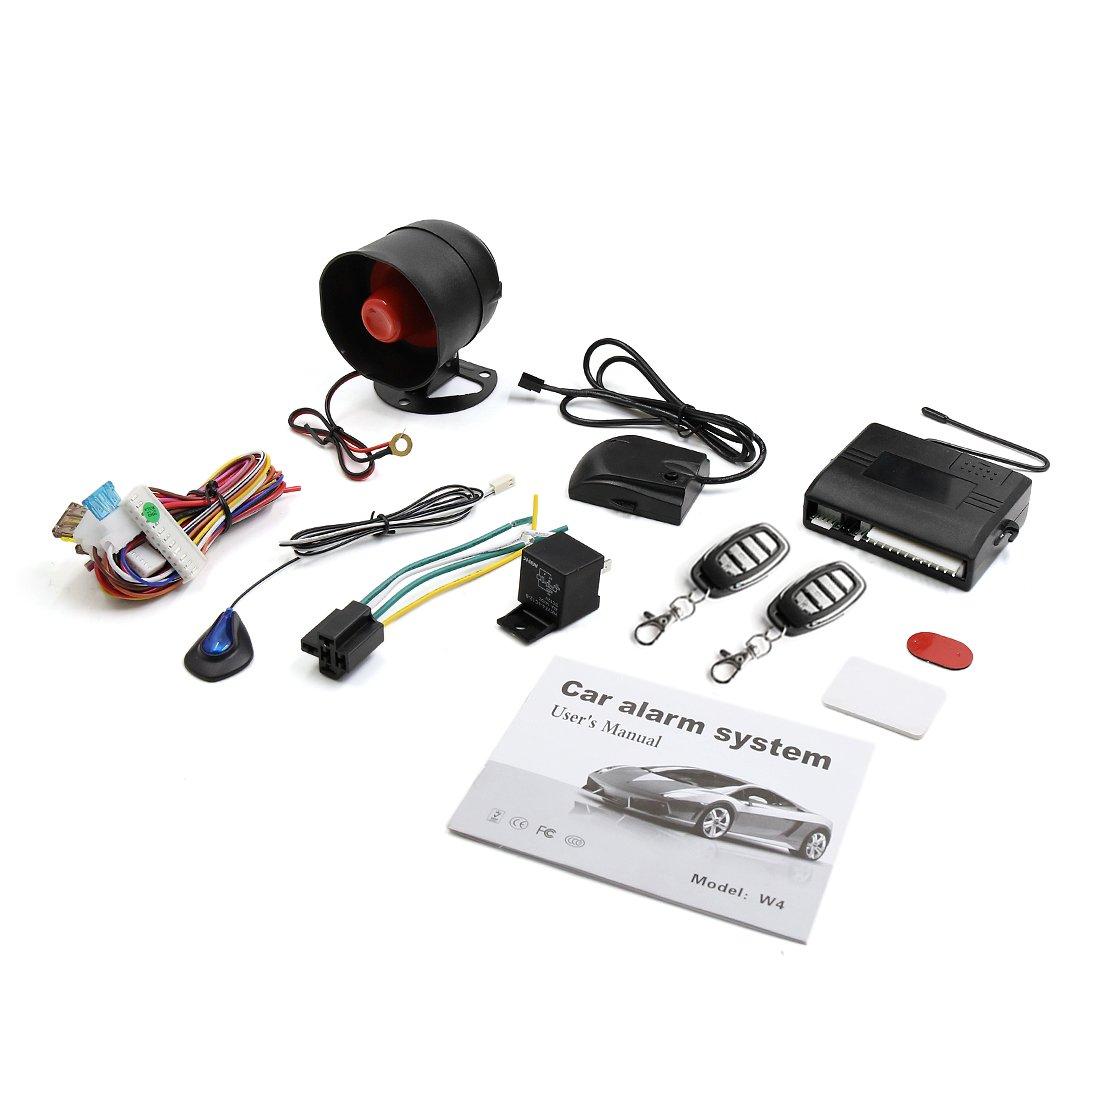 X Autohaux Car Keyless Entry Security Alarm System 1 Way Avital 3100 Wiring Diagram Vehicle Anti Theft Siren W 2 Remote 12v Automotive